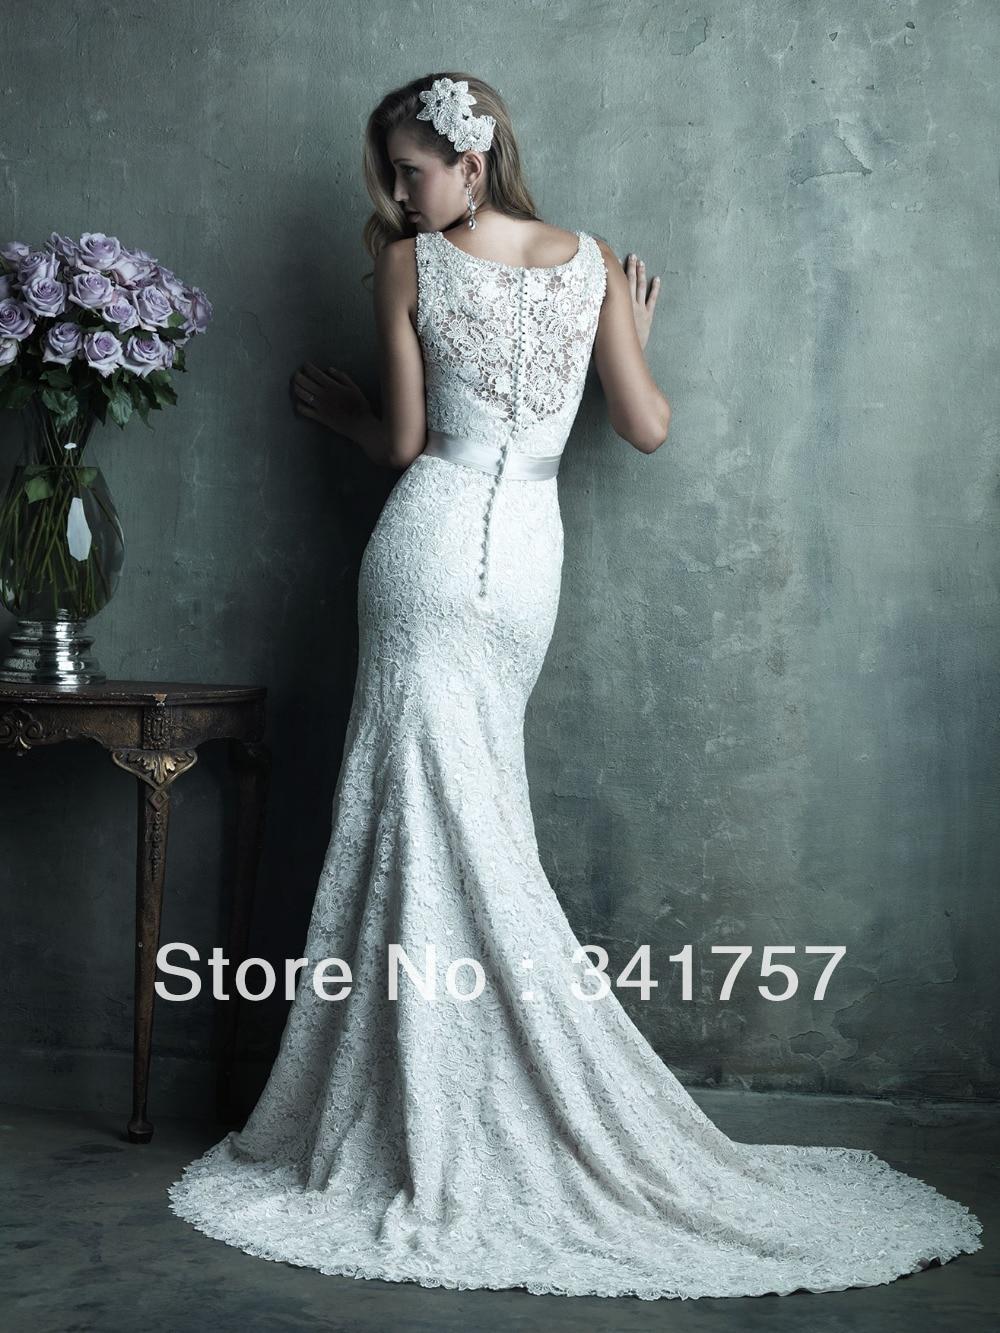 Unique Wedding Dress Corset Bra Gift - All Wedding Dresses ...